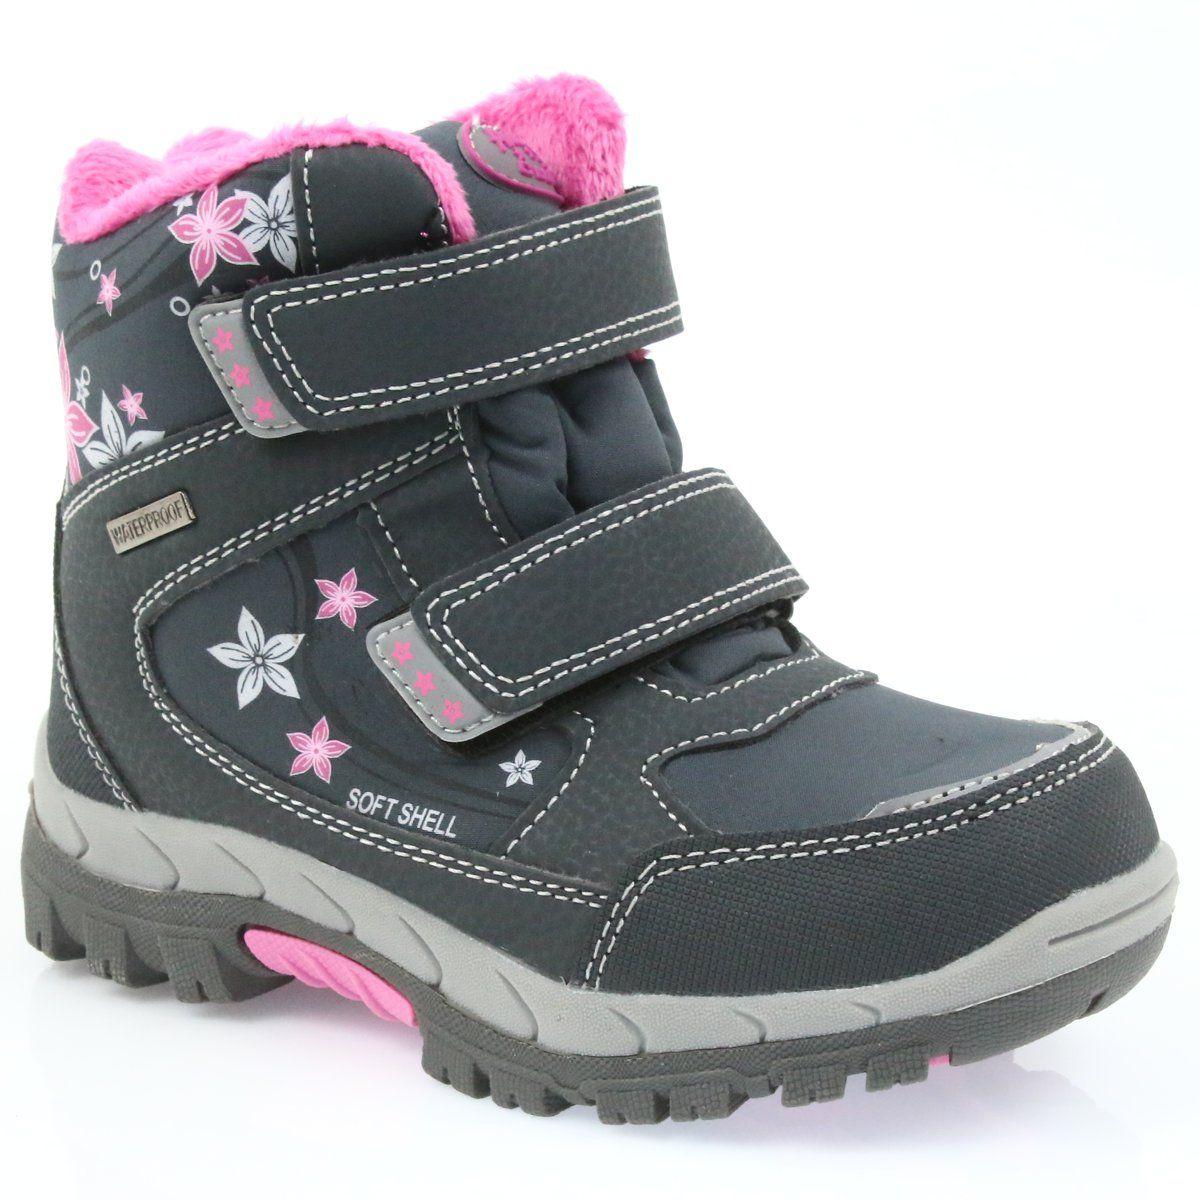 American Club American Buty Zimowe Z Membrana 3121 Rozowe Wedge Sneaker Shoes Sneakers